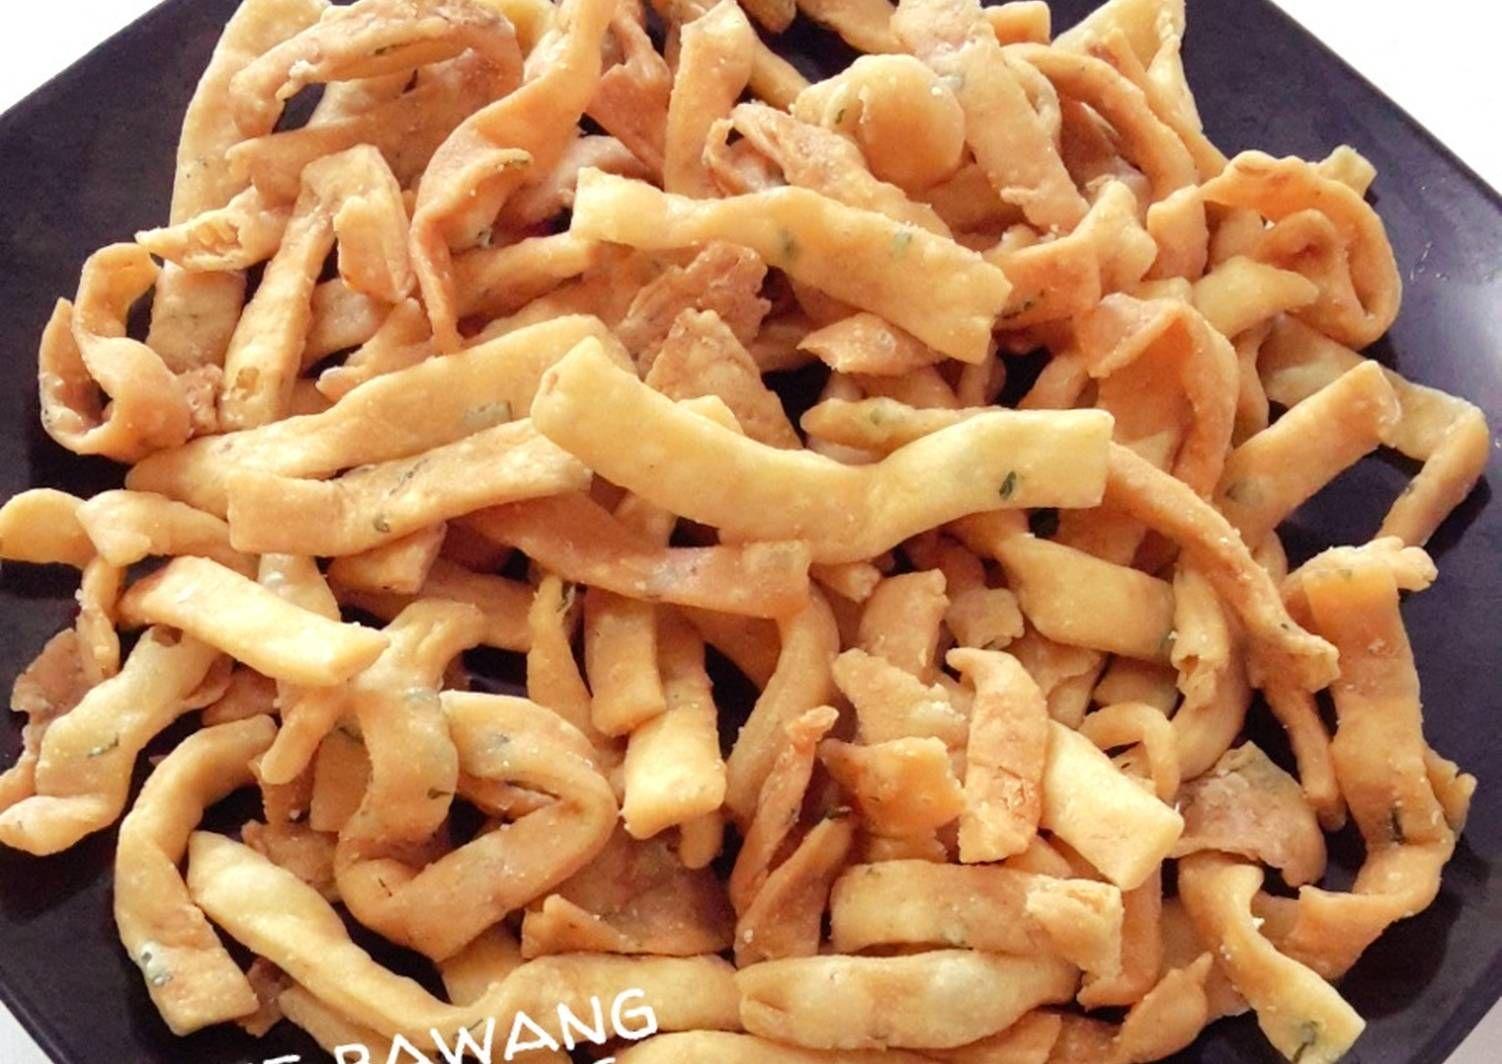 Resep Kue Bawang Renyah Oleh Amei Resep Makanan Ringan Pedas Resep Kue Makanan Ringan Gurih